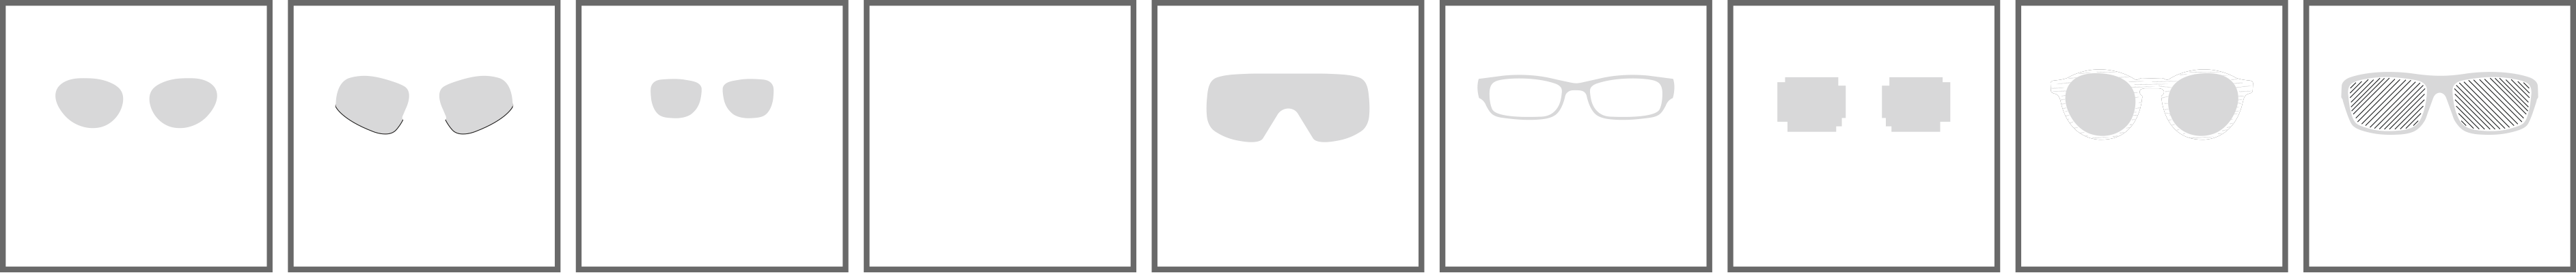 Montature gadget occhiali